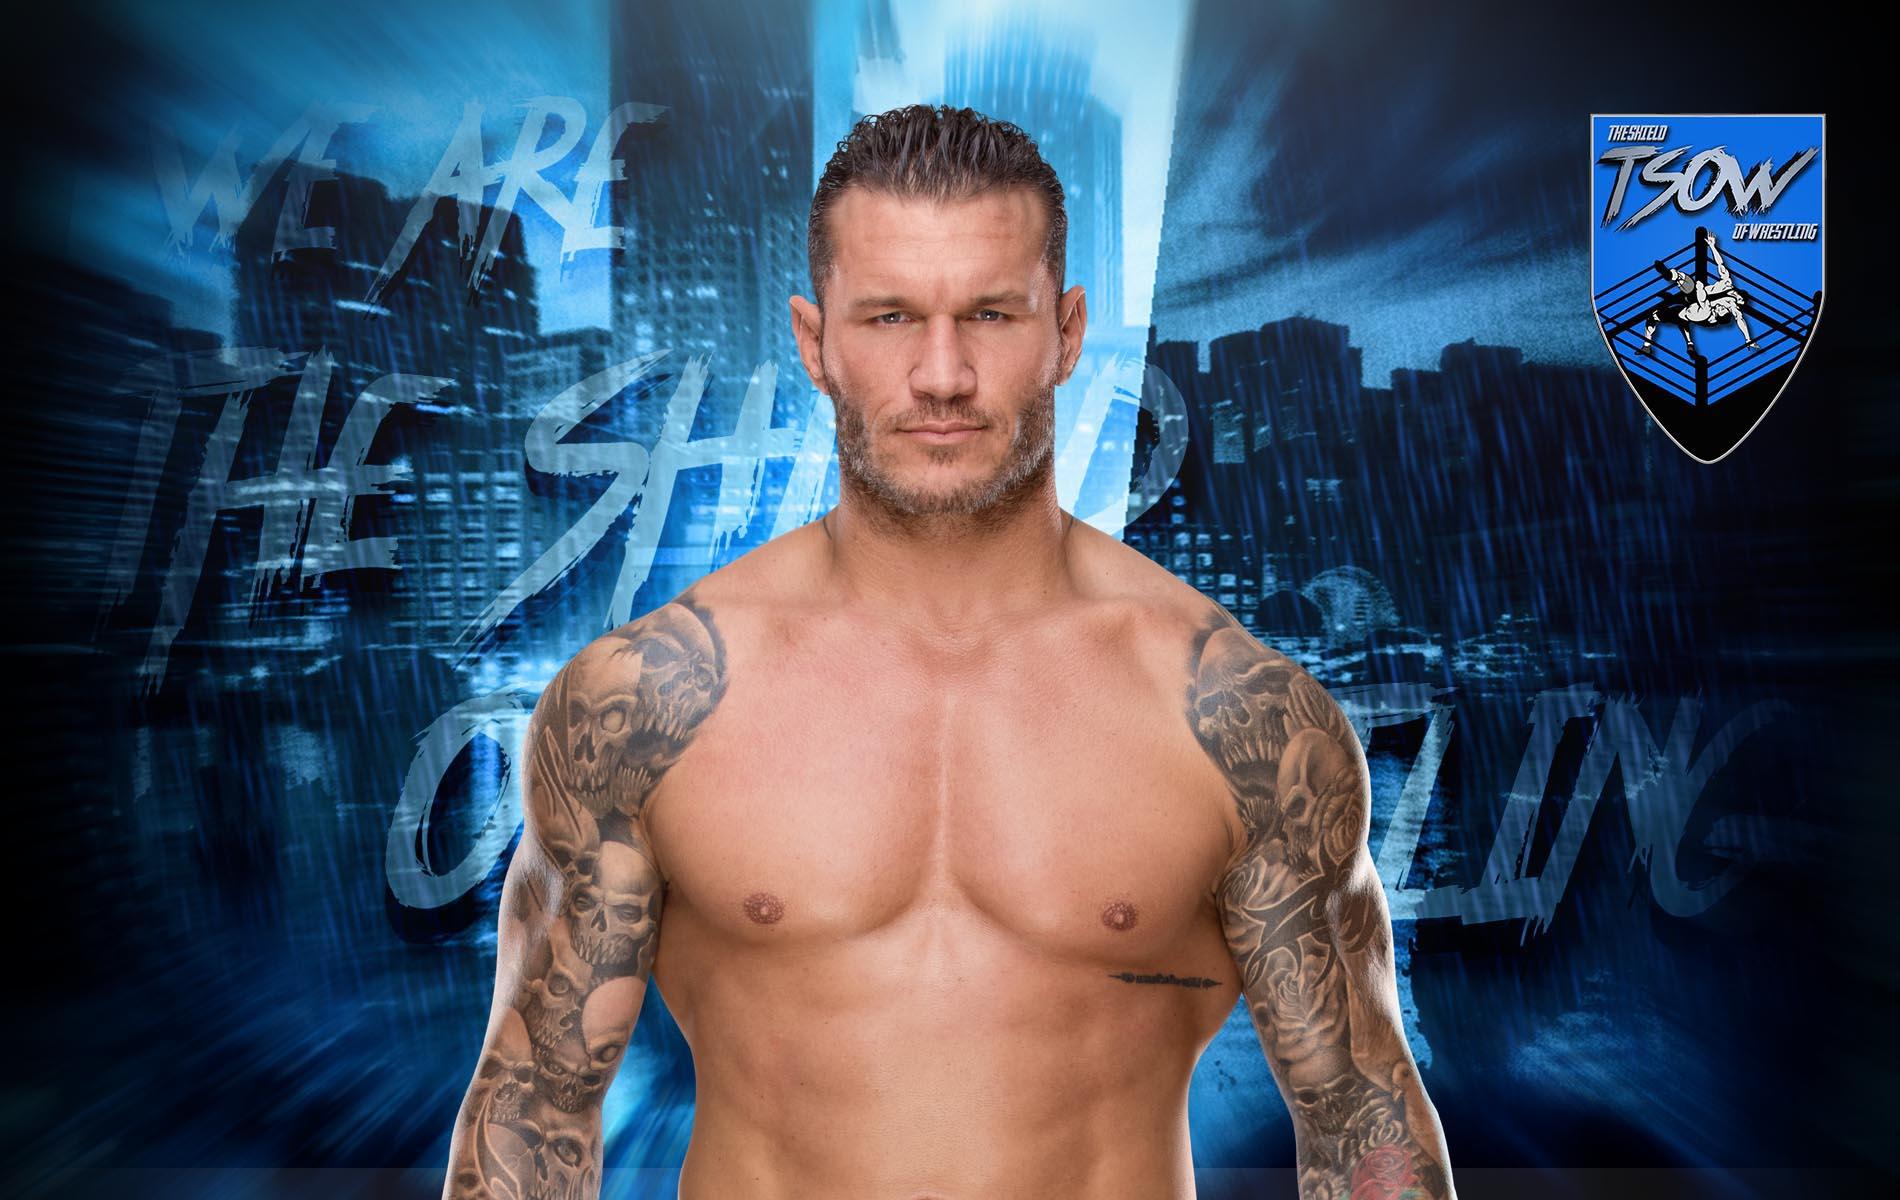 Jim Ross ricorda la frase di Randy Orton su Eddie Guerrero